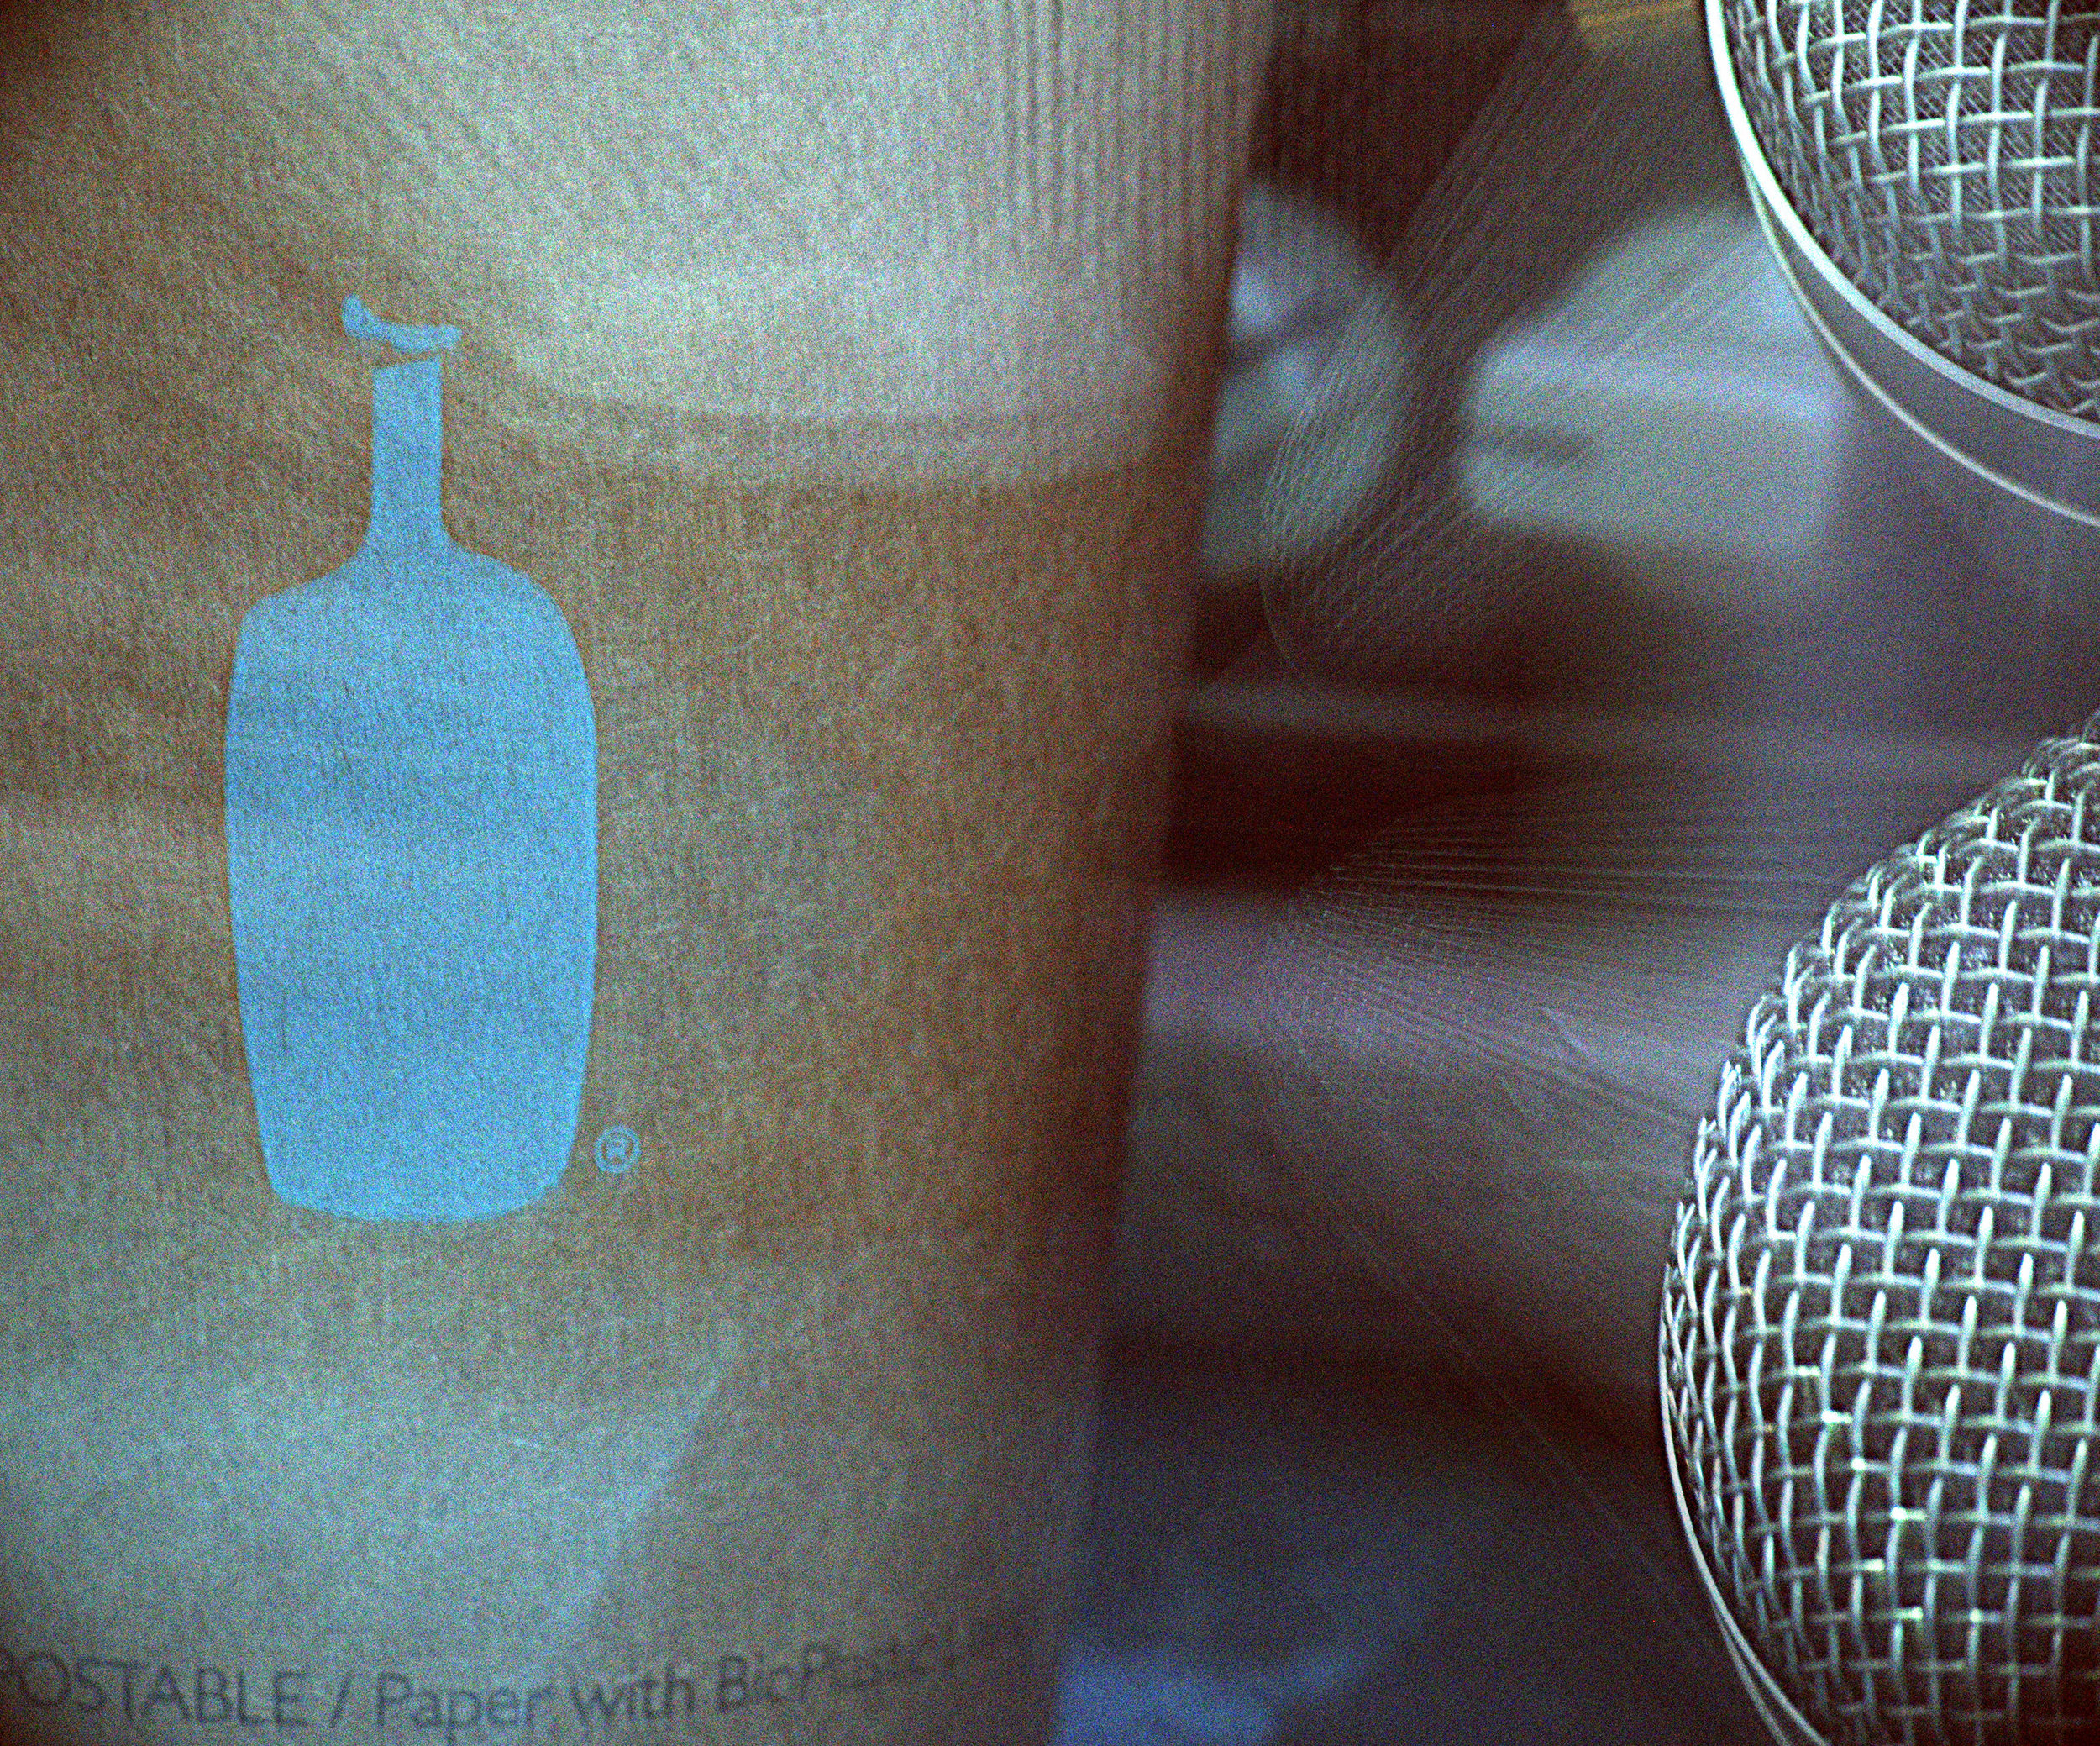 Blue Bottle Coffee x D'Herde East. Photo by Ryan D'Herde